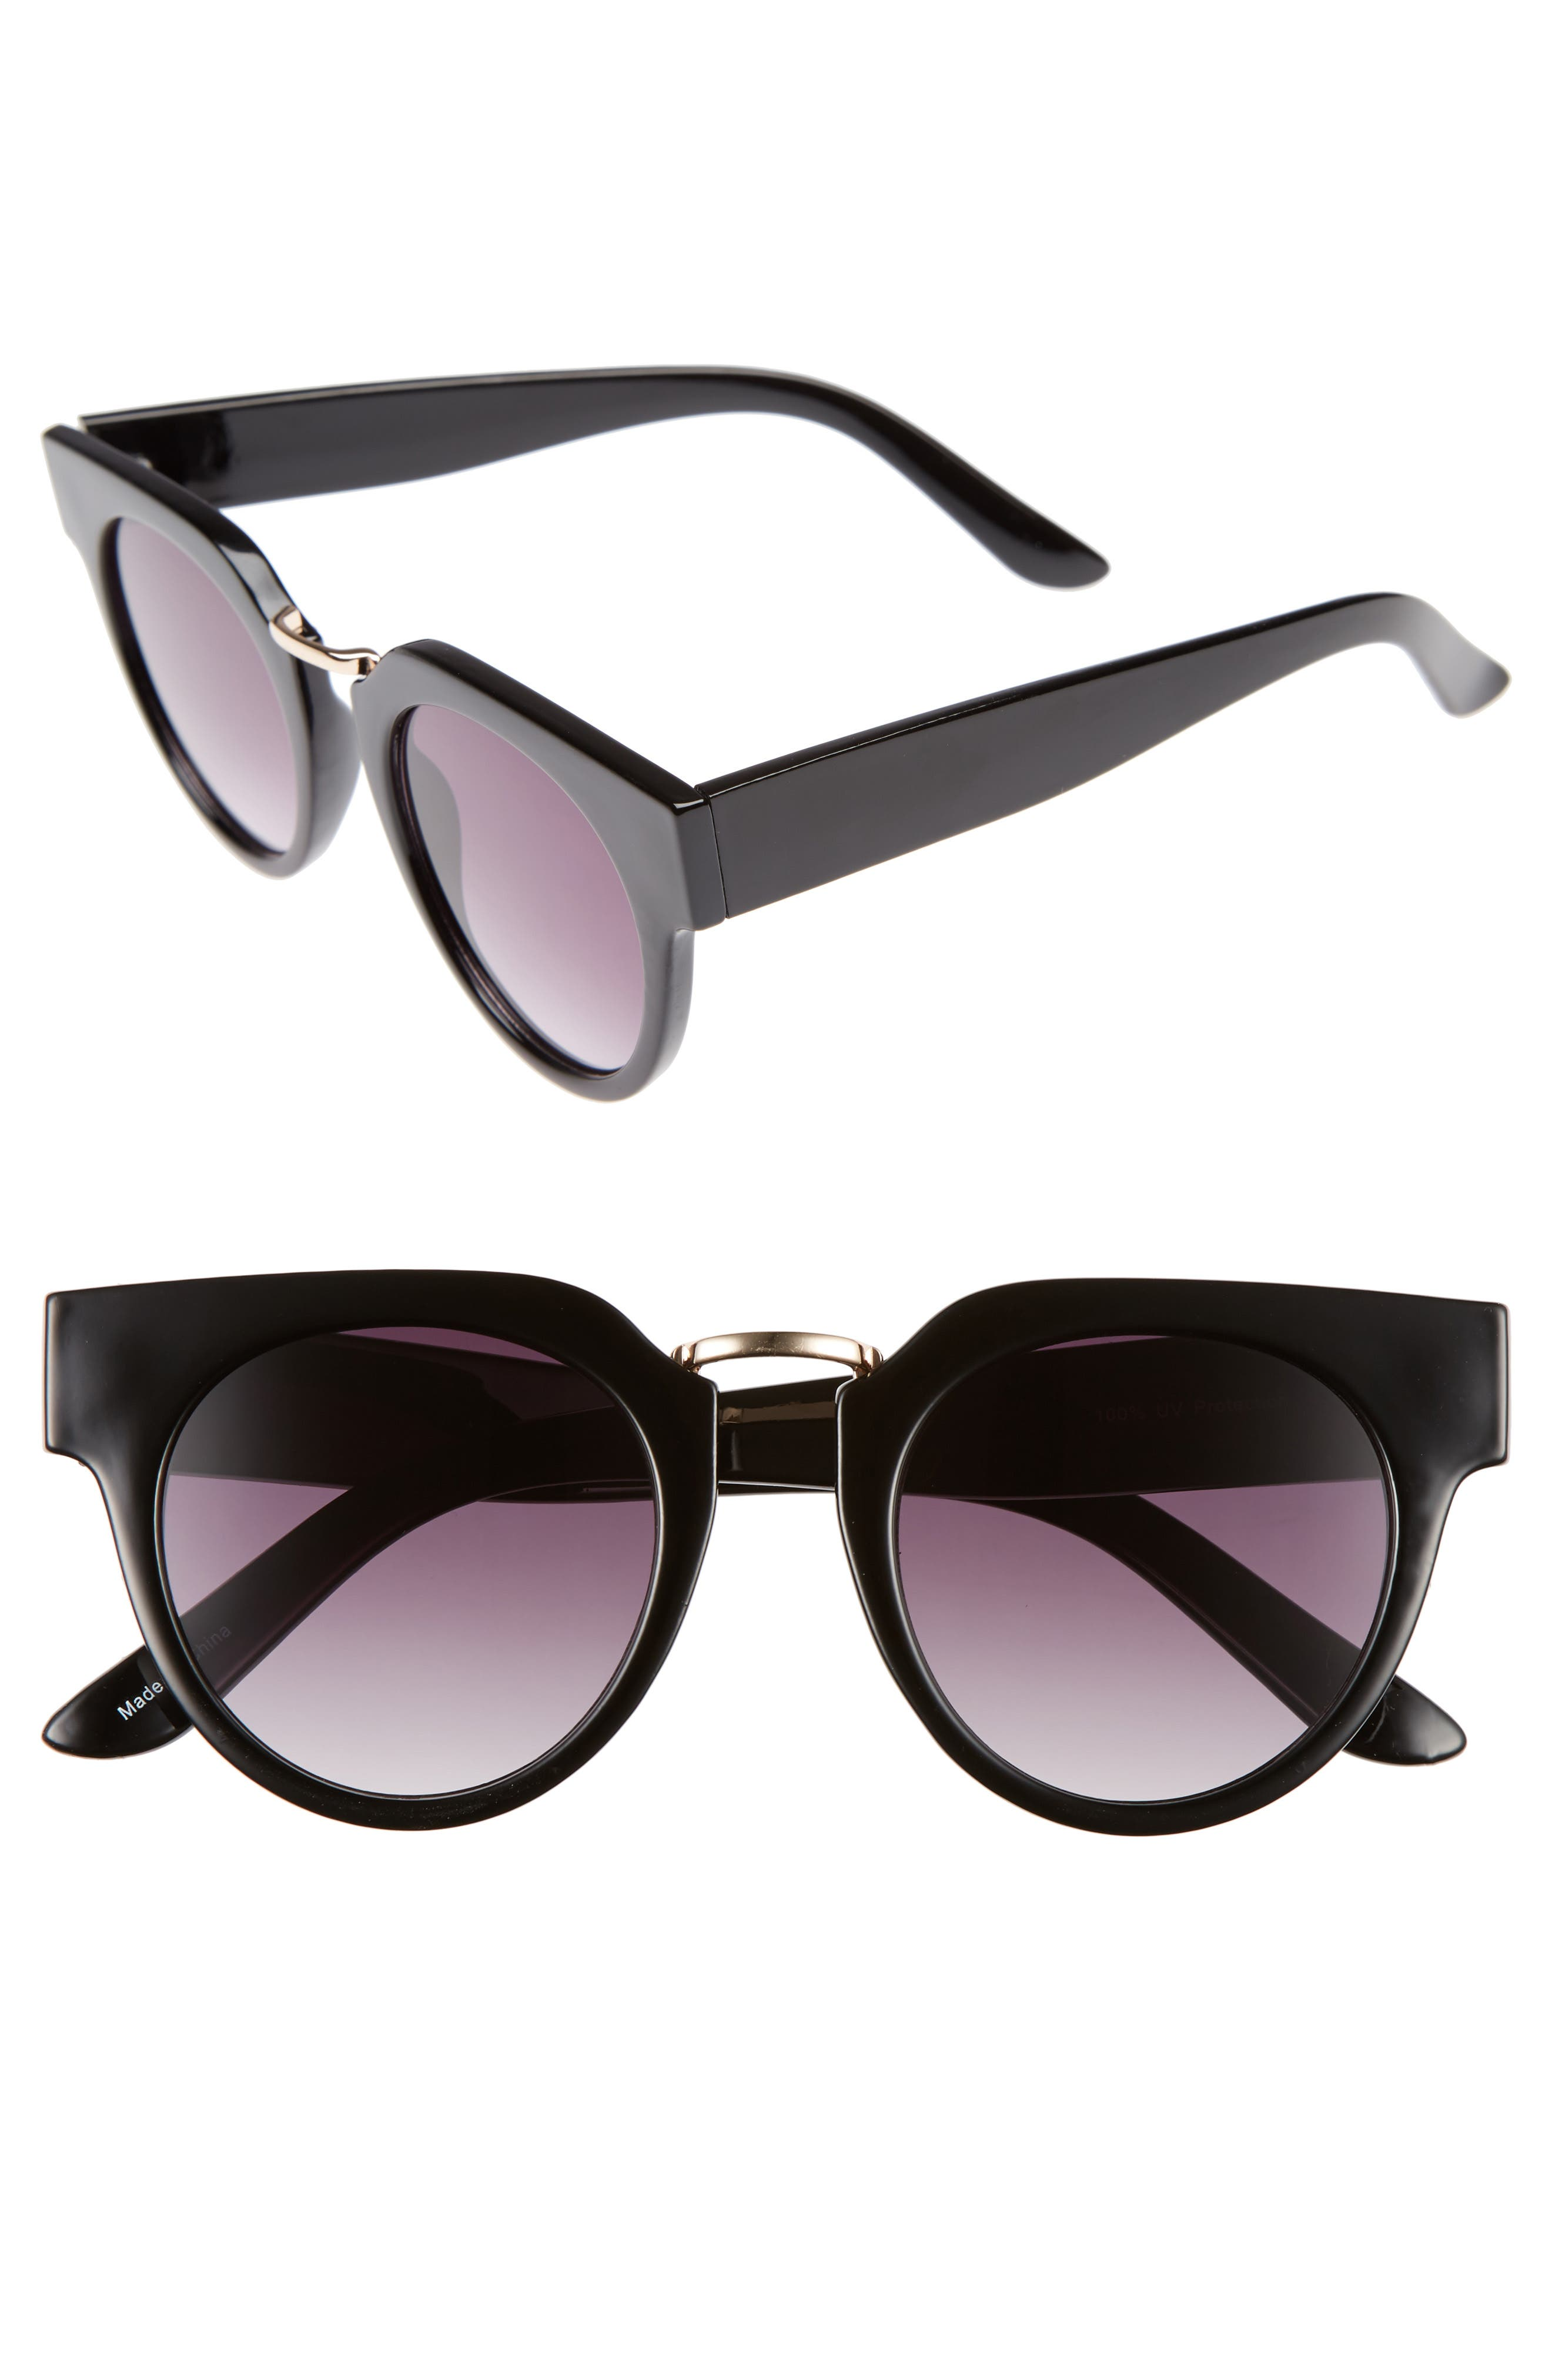 48mm Round Sunglasses,                         Main,                         color, 001